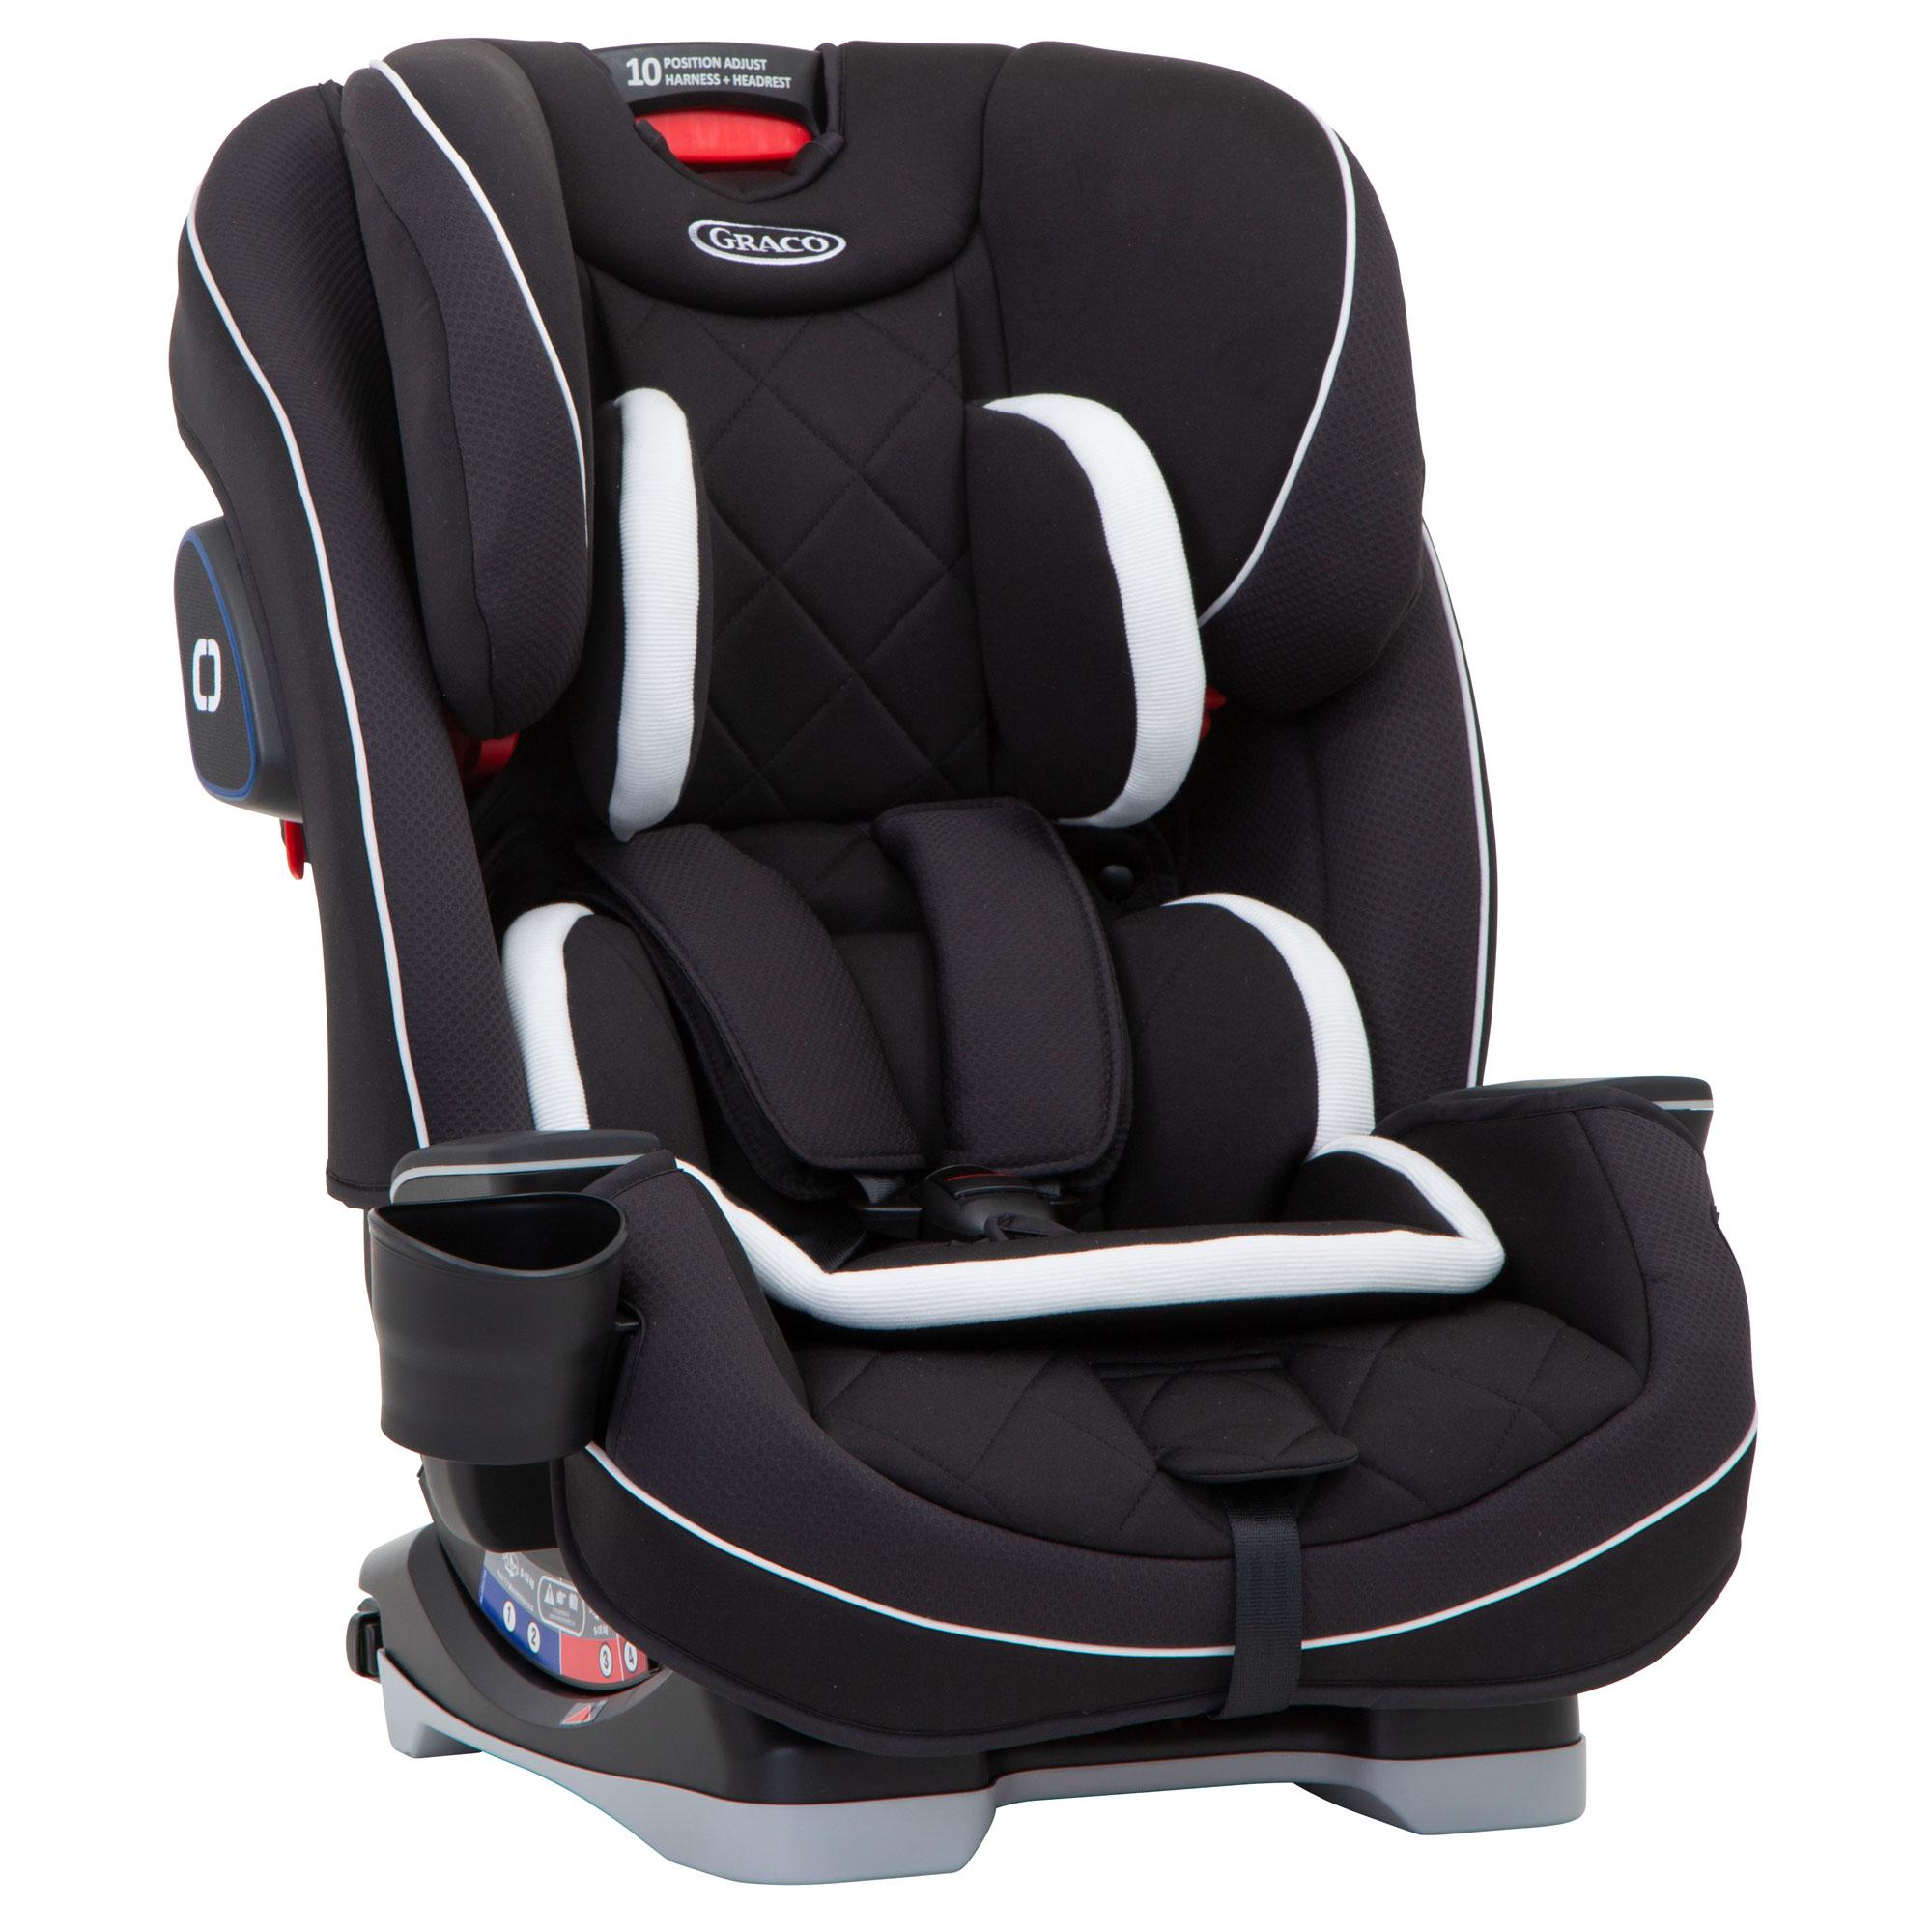 da7cc8b9699f Graco Slimfit LX Group 0+123 Car Seat - Midnight Black - Baby and ...